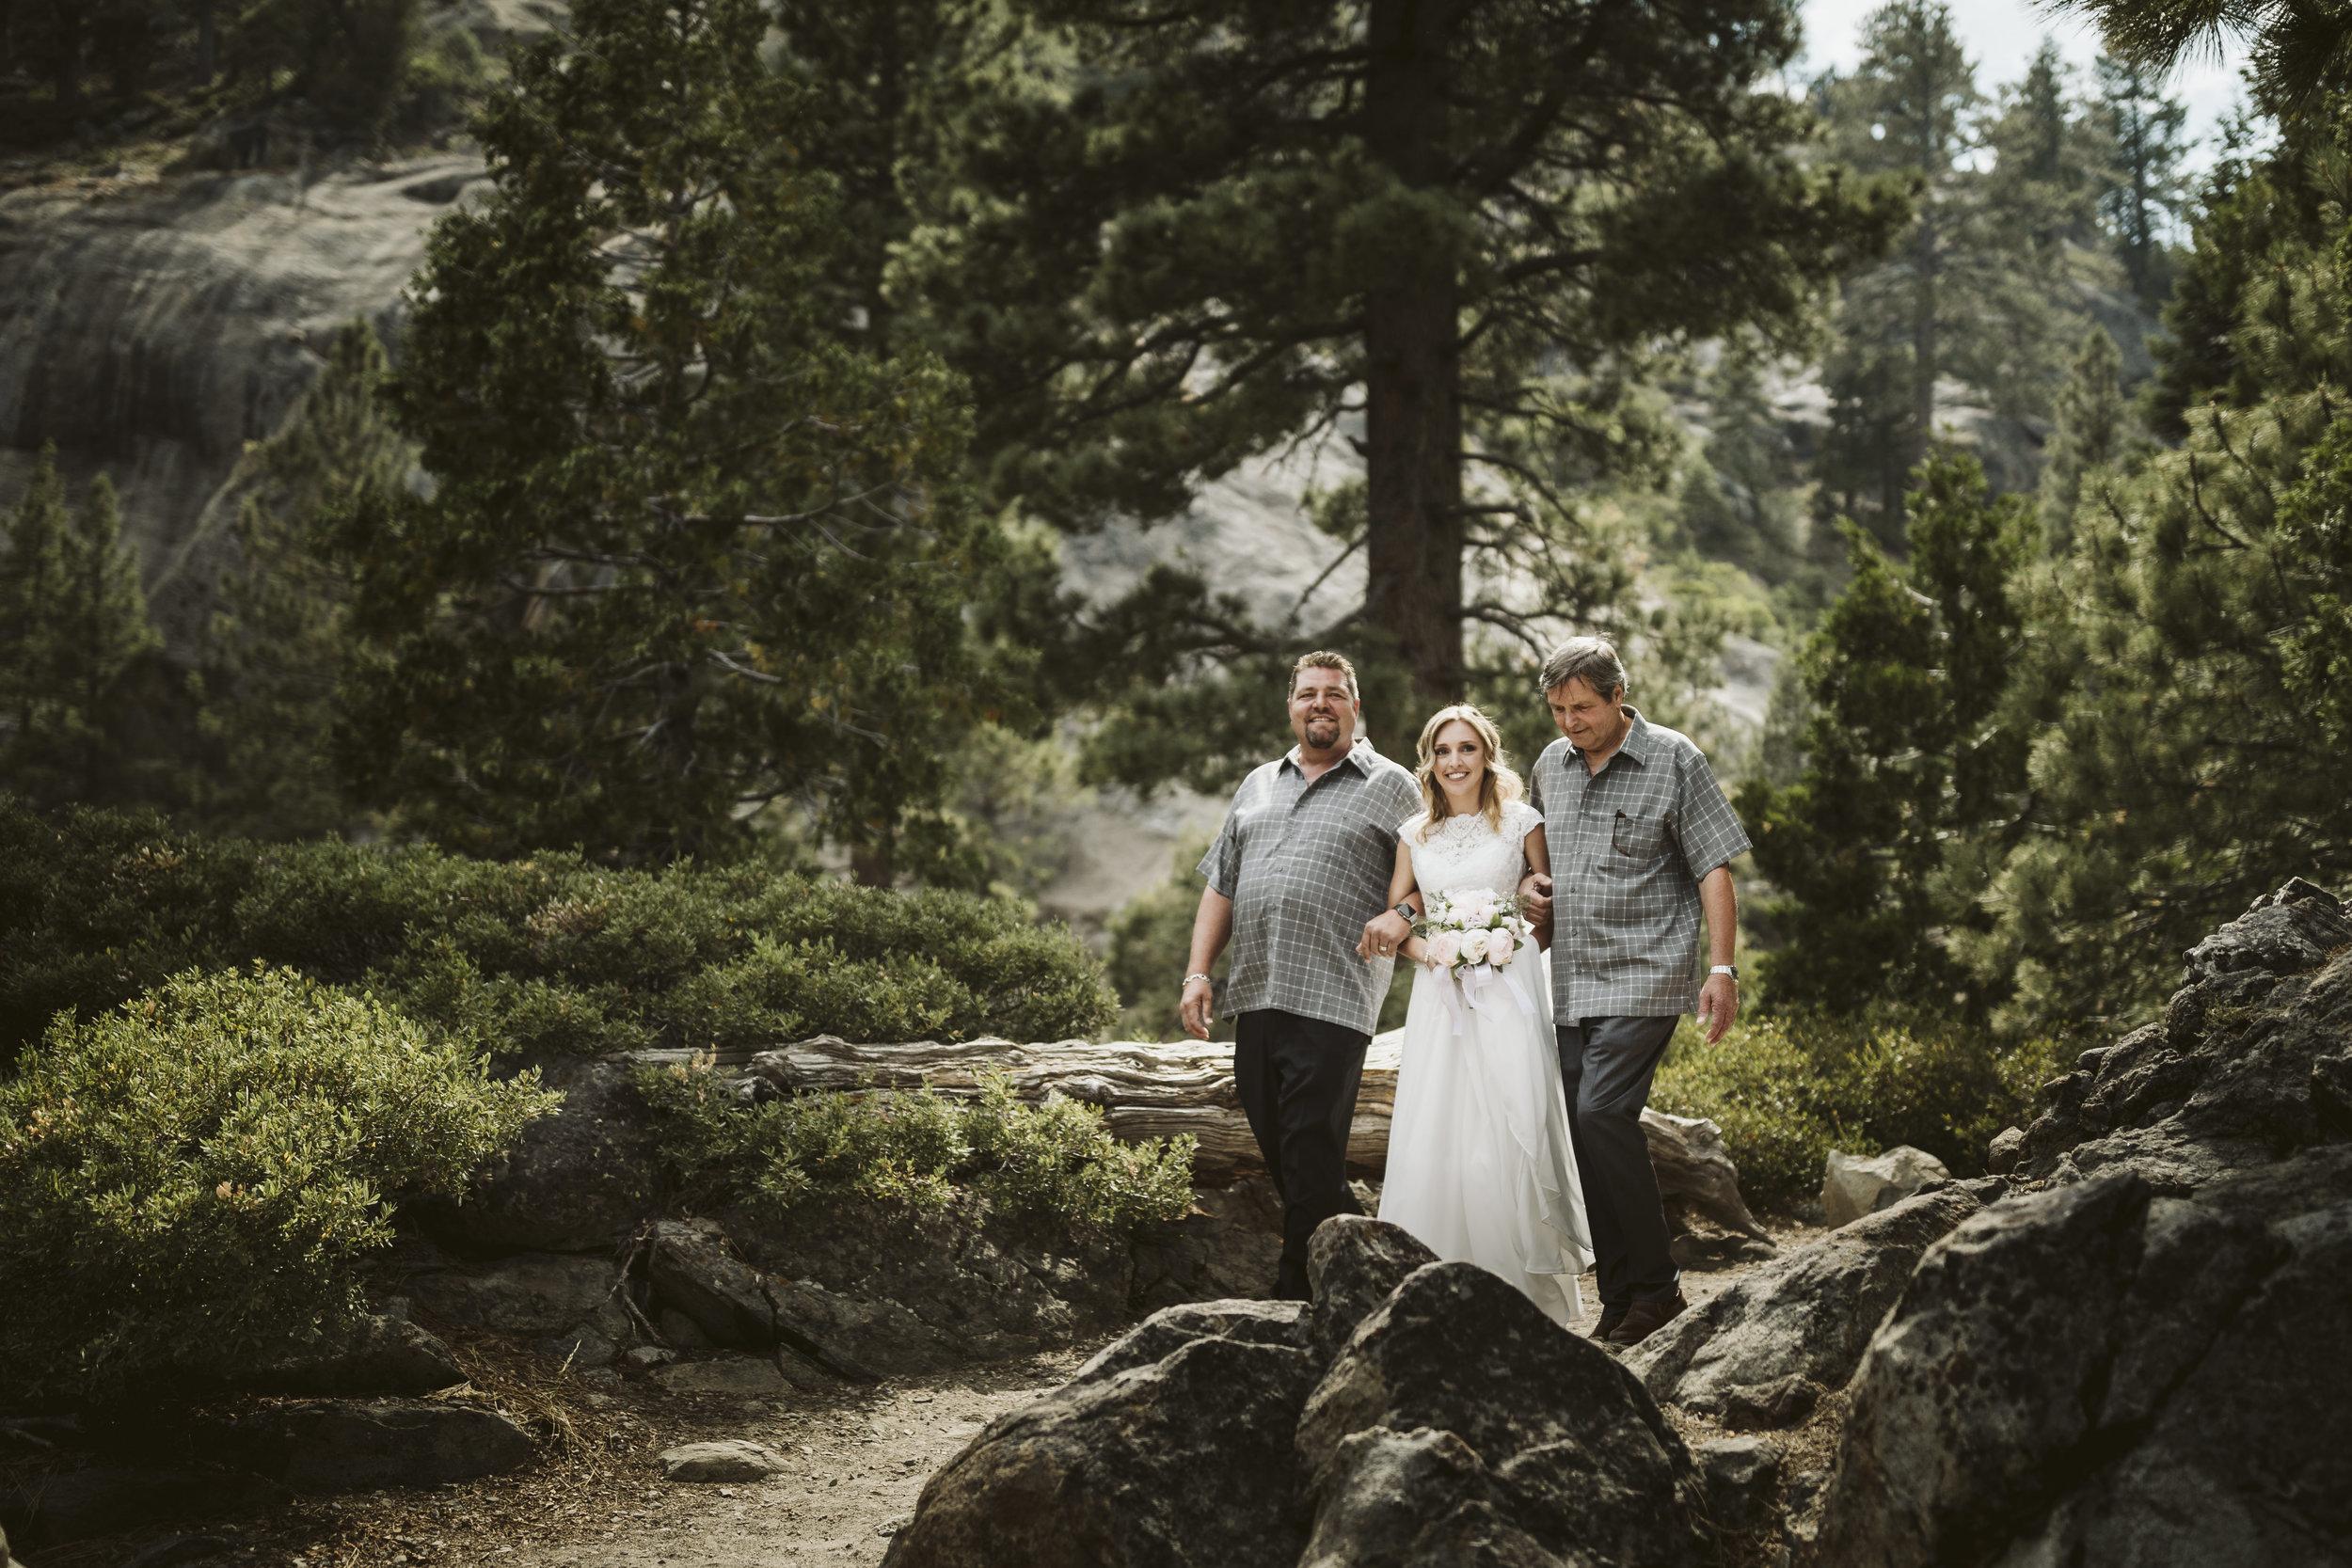 0M7A0671vildphotography-adventurewedding-adventurouswedding-tahoewedding-laketahoewedding-adventureelopement-laketahoeweddingphotographer-wedding-photographer-weddingphotographer-Chase-Sam.jpg